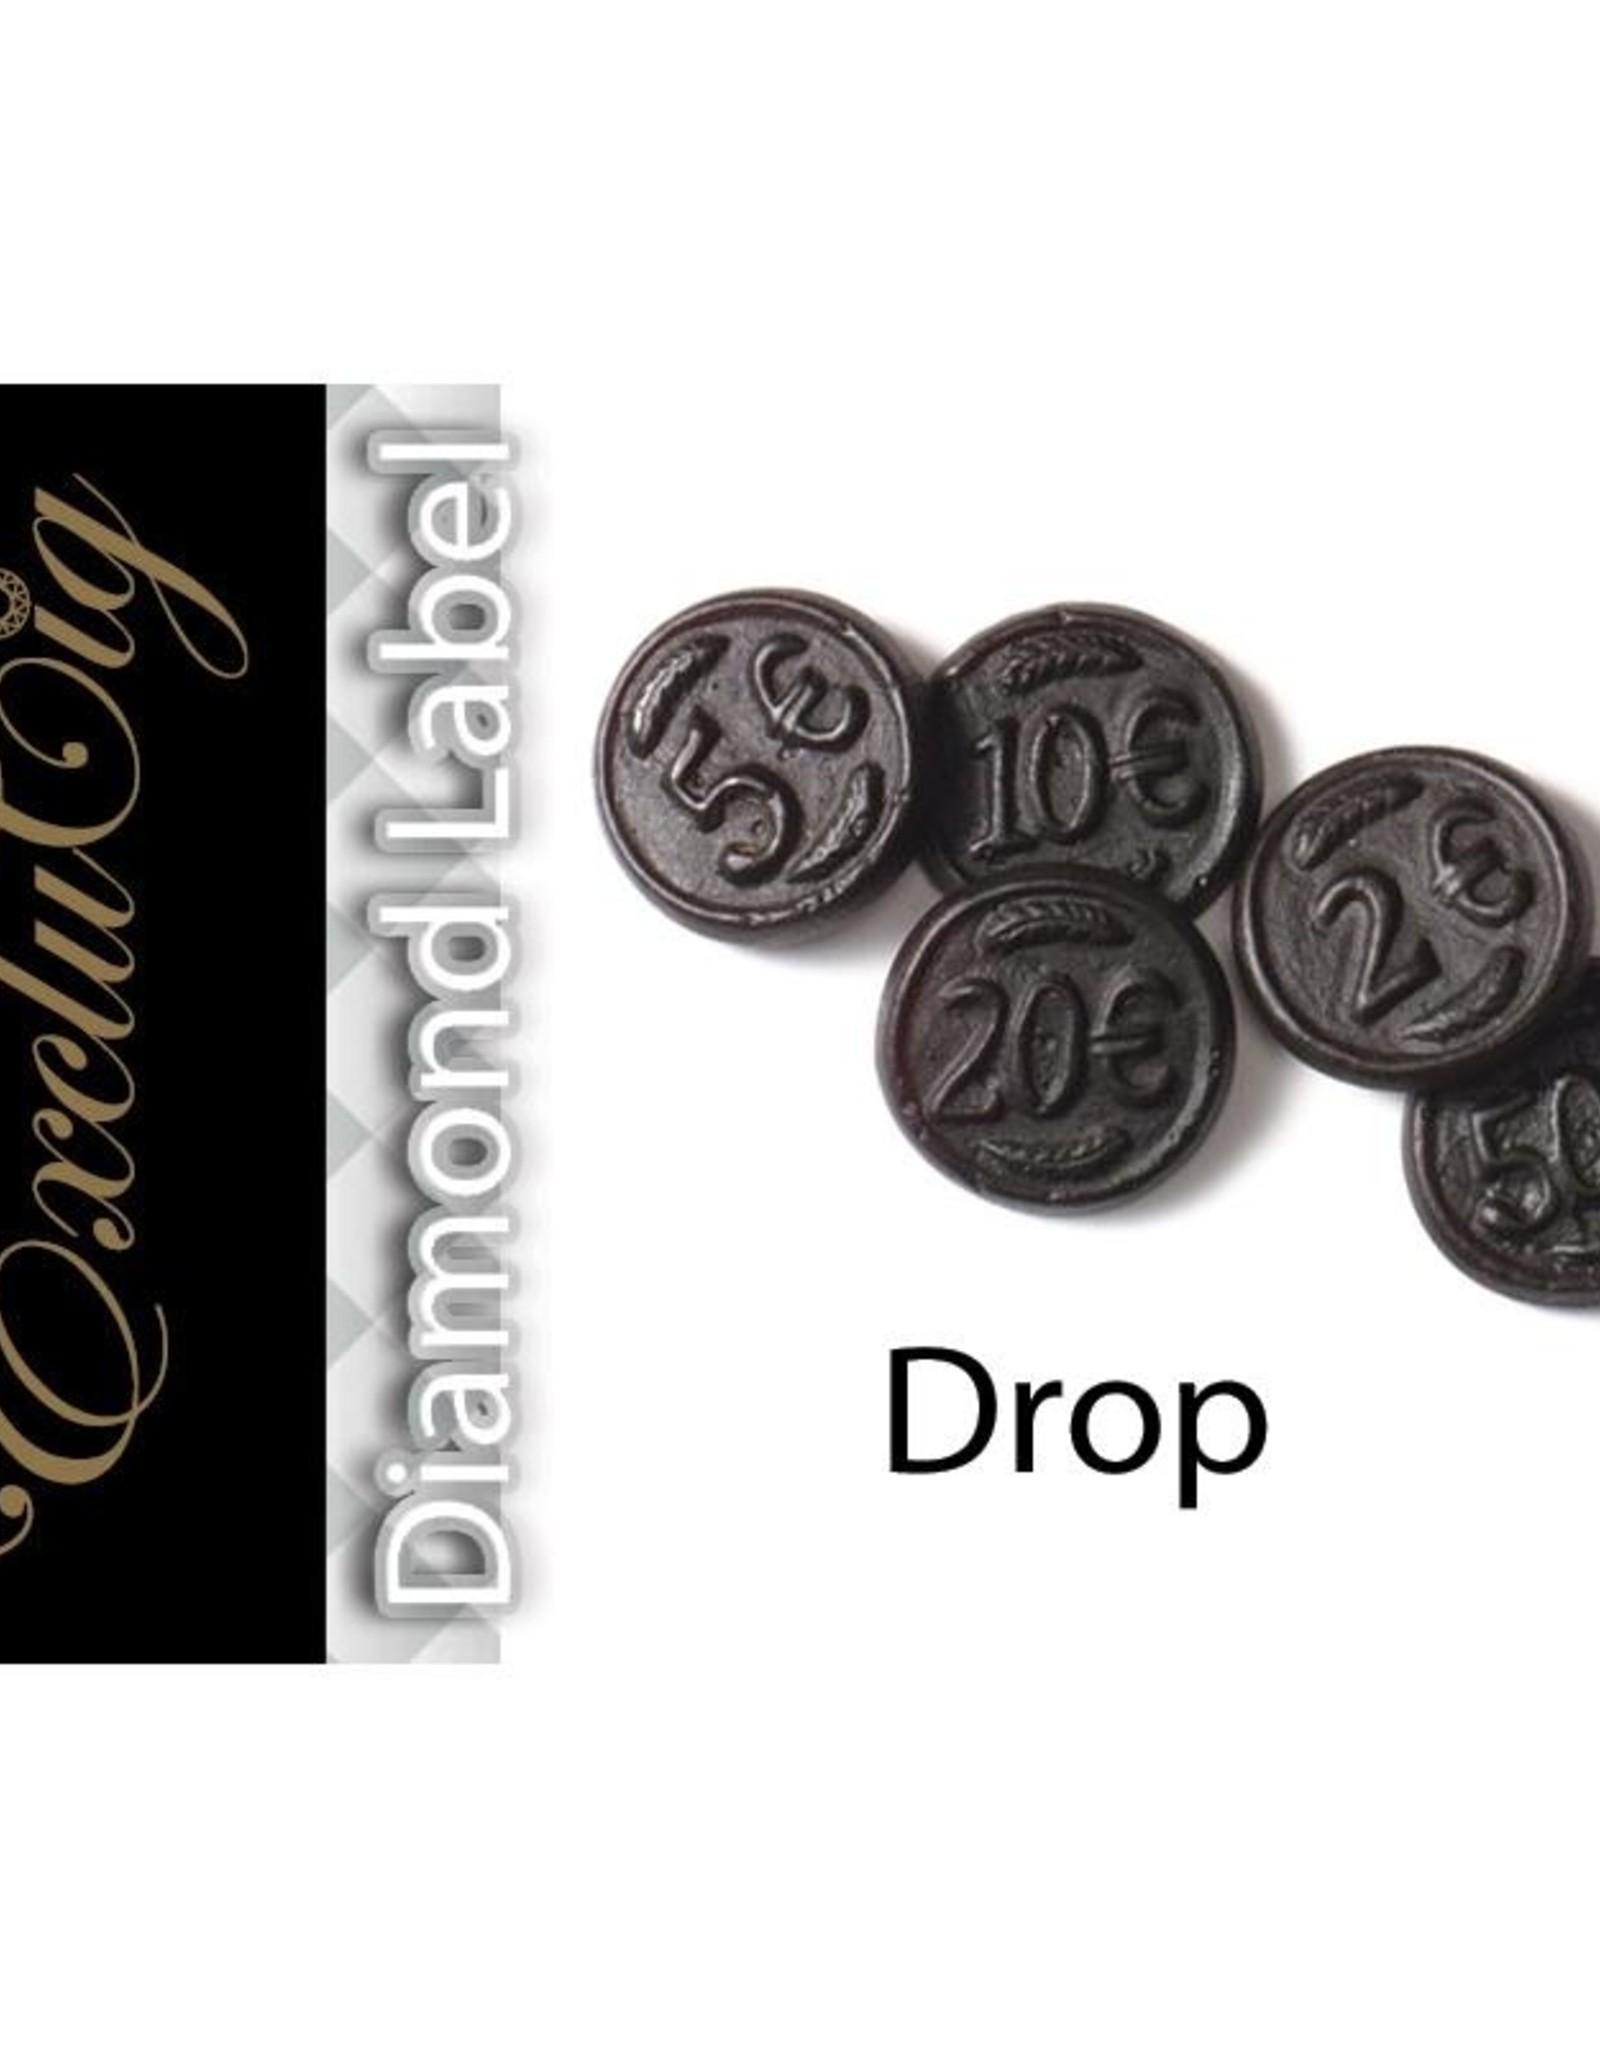 Exclucig Exclucig Diamond Label E-liquid Drop 0 mg Nicotine